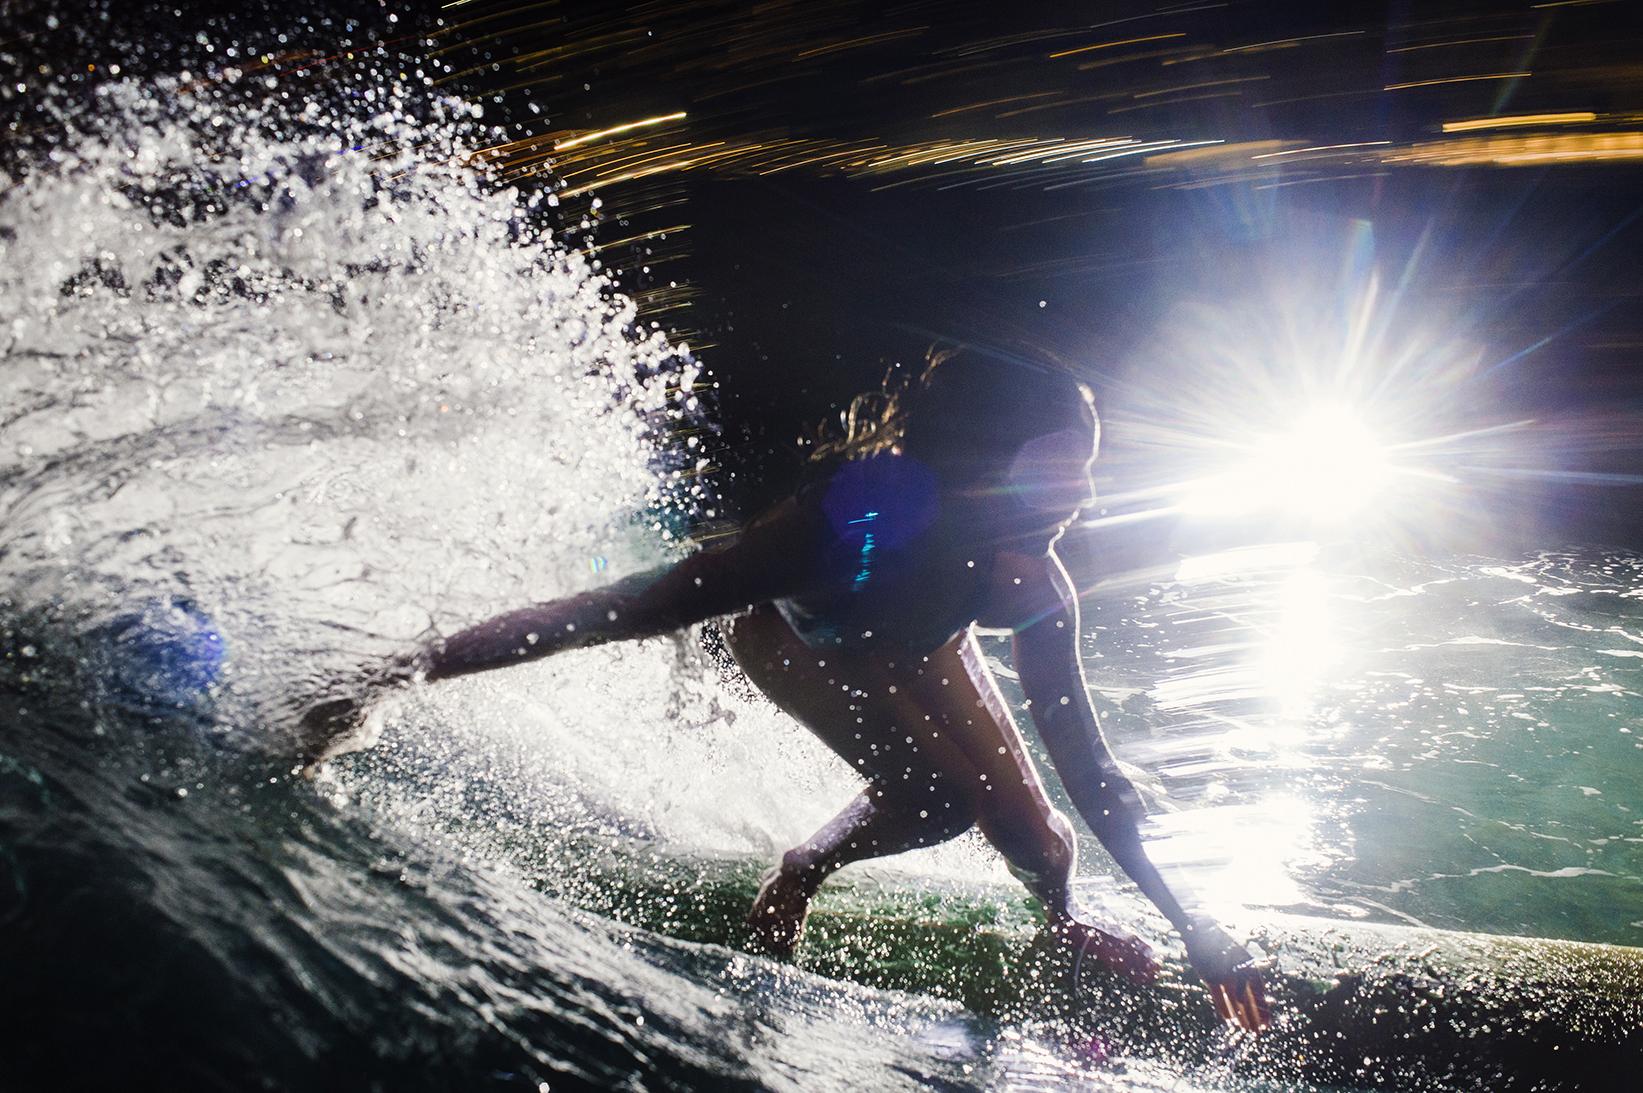 night_surfing_waikiki0003 small.jpg